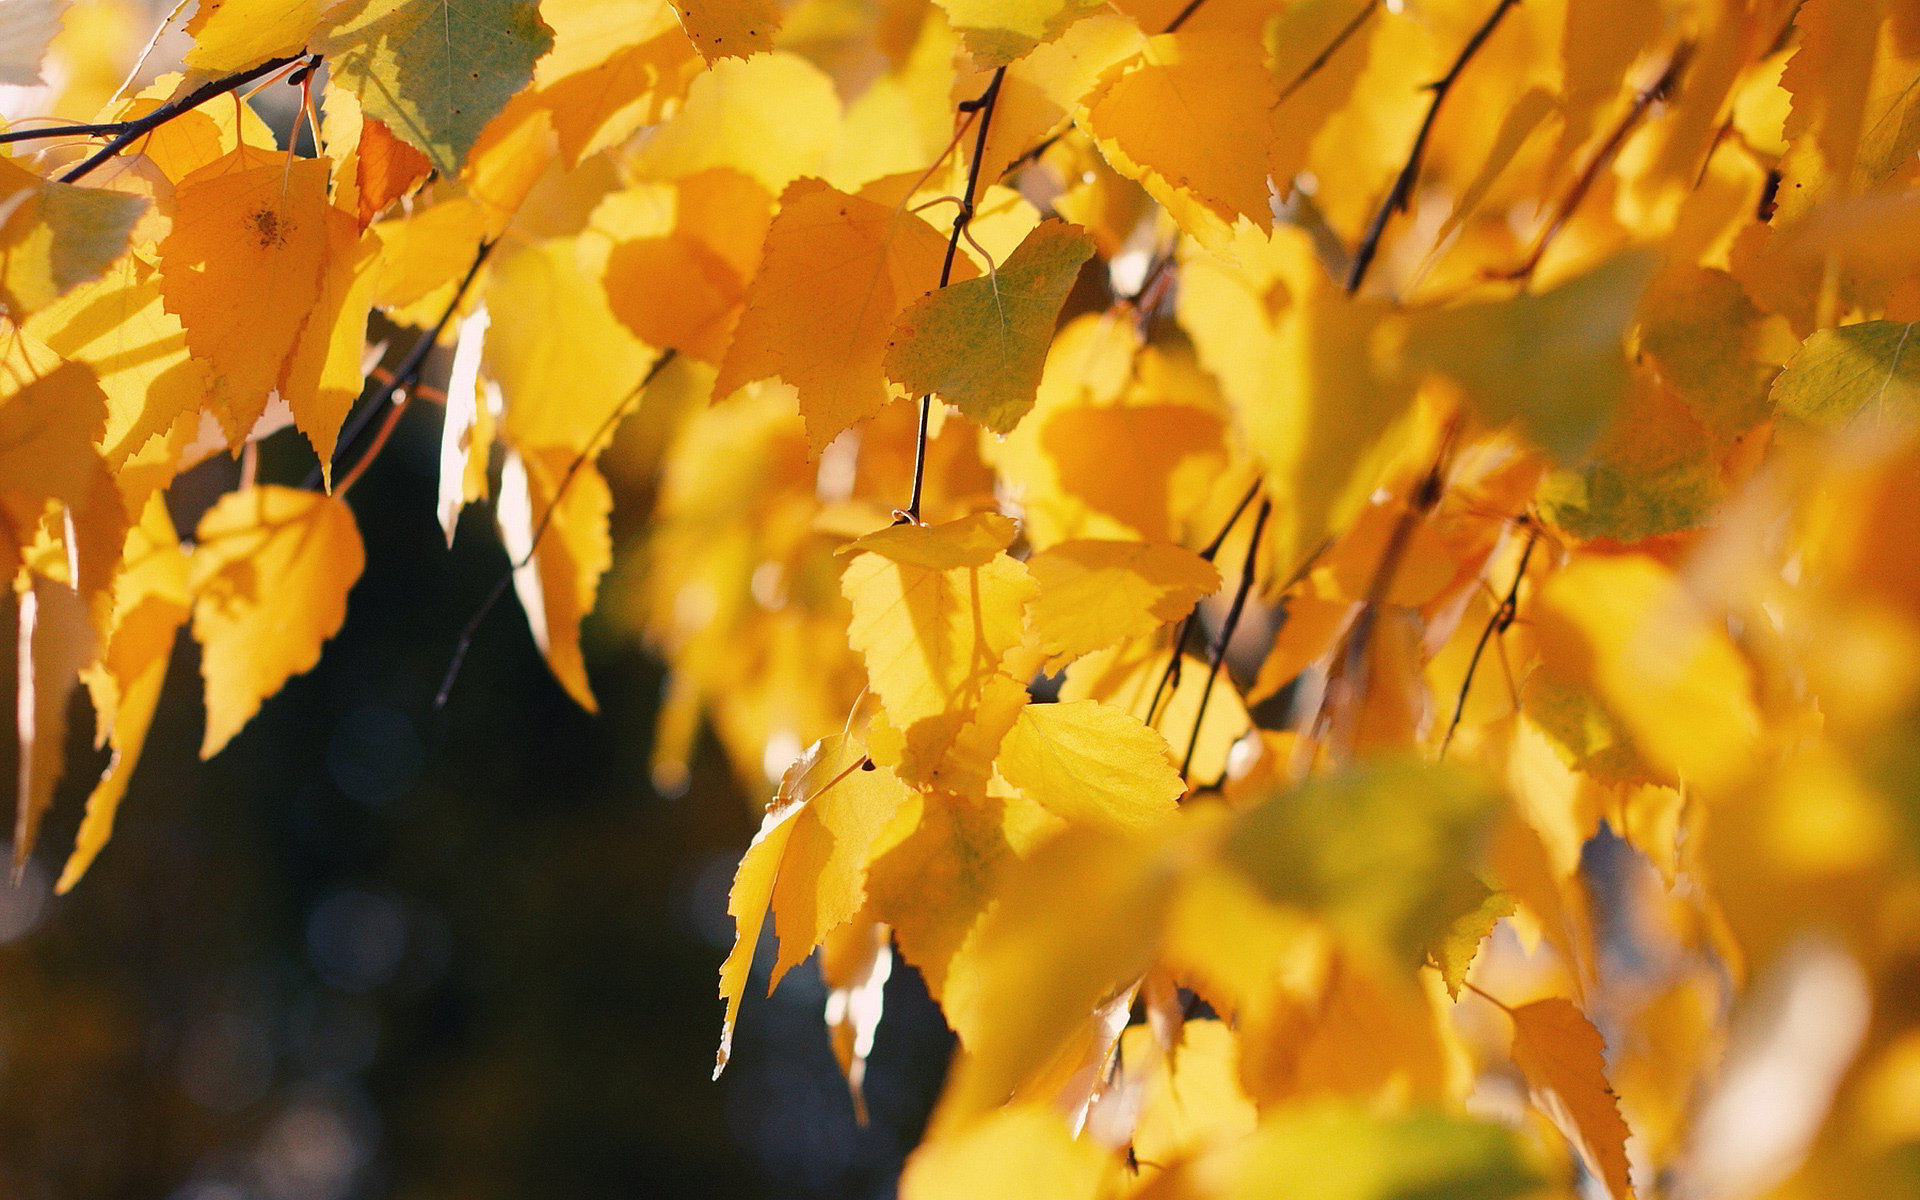 Falling Leaves Animated Wallpaper Autumn Birch Wallpaper Hd Desktop Wallpapers 4k Hd